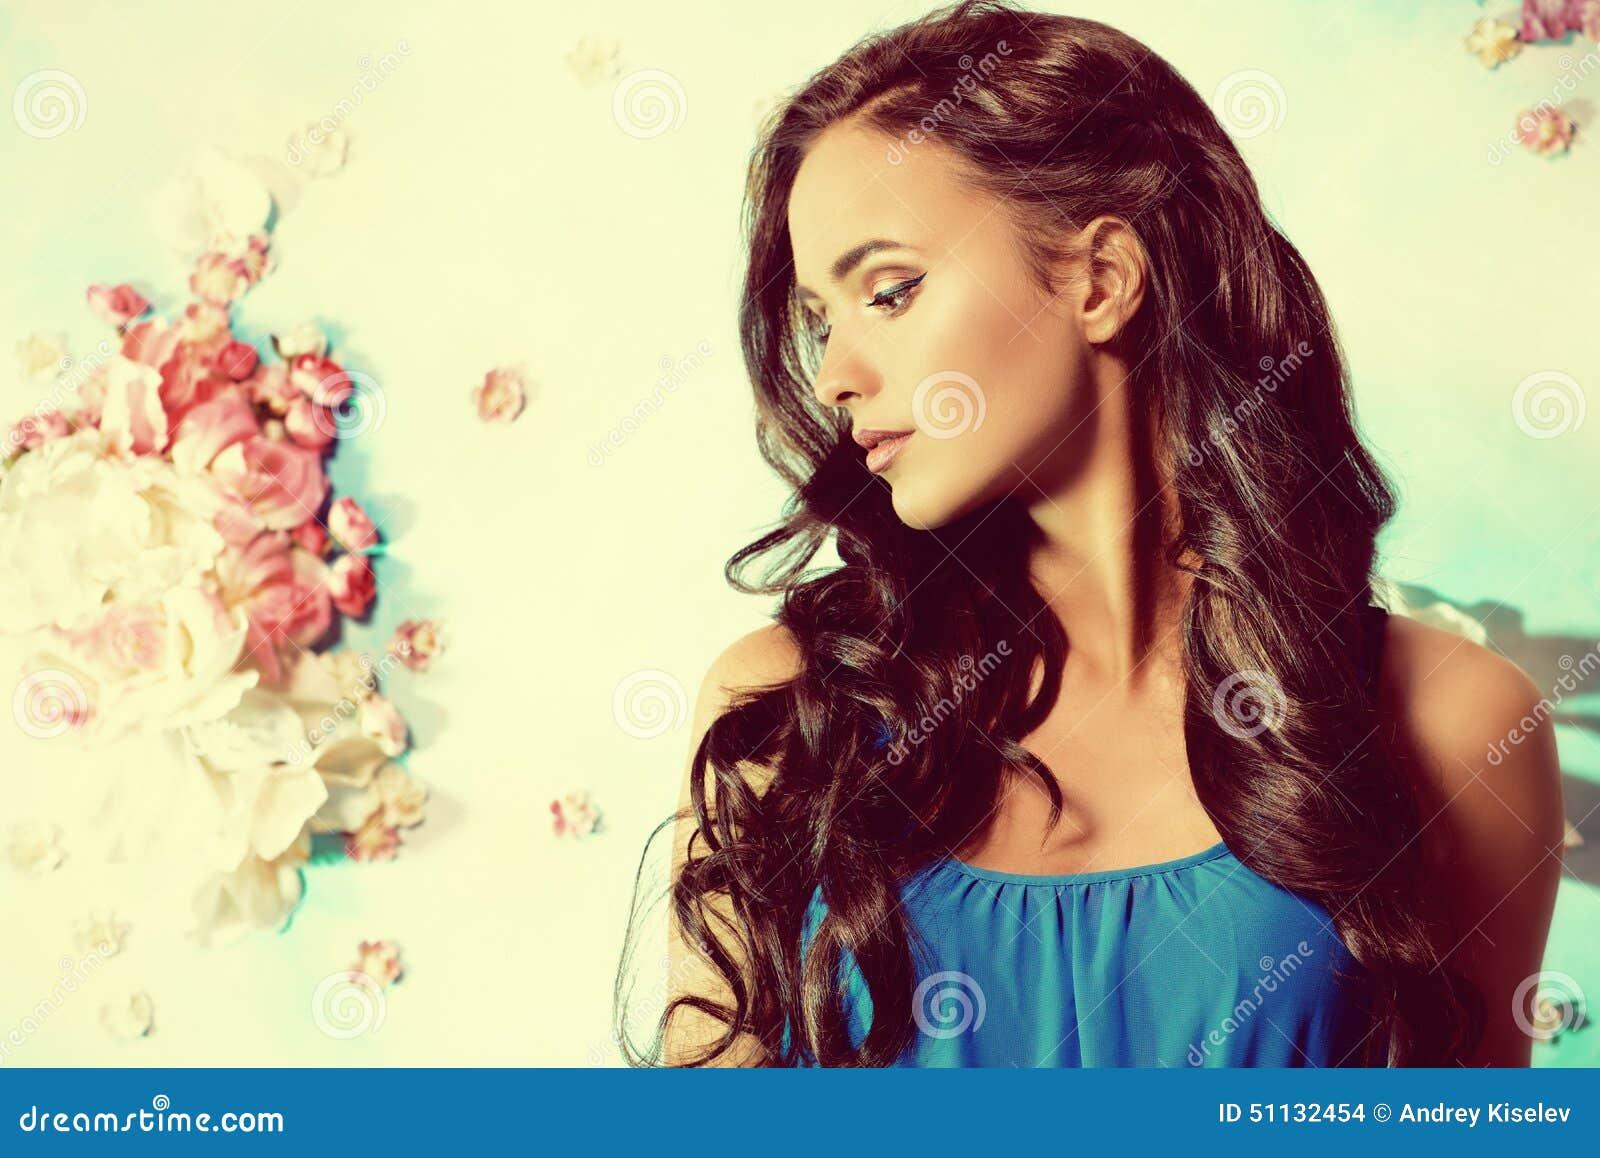 Tender beauty stock photo. Image of adult, girl, beauty